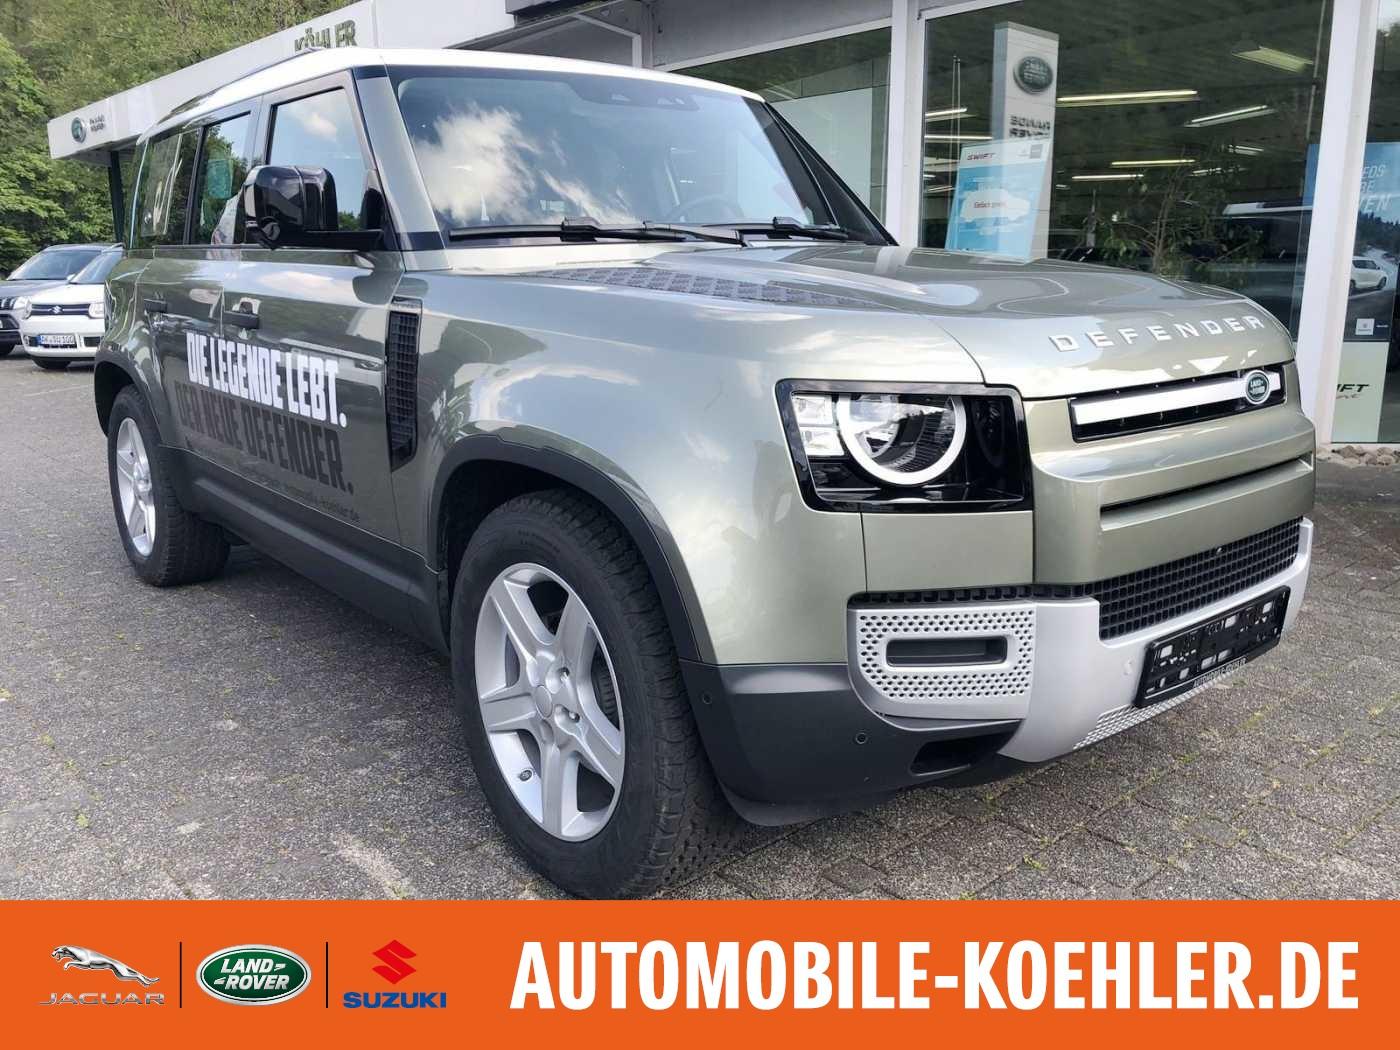 Land Rover Defender 110 D240 S AHK,20'LM,SD,OFF ROAD-PAKET, Jahr 2020, Diesel